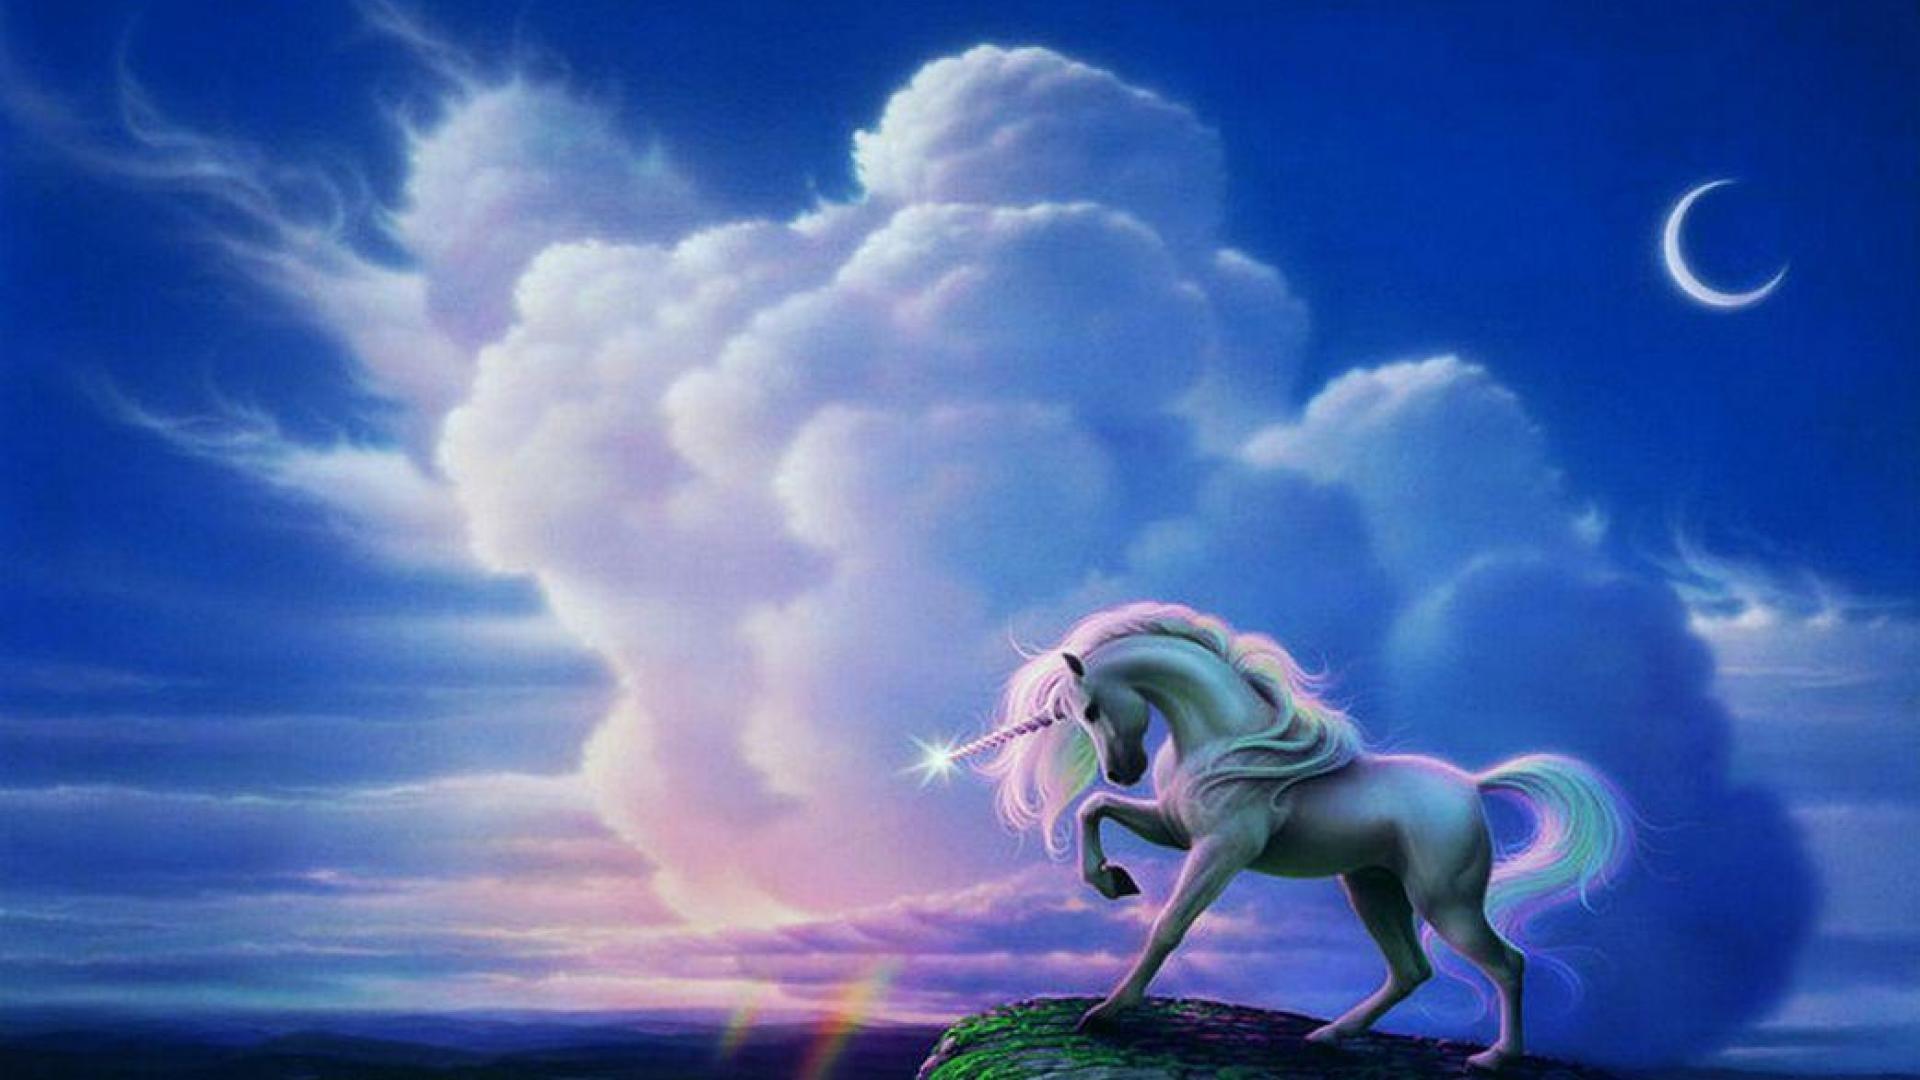 Unicorn Computer Wallpaper Posted By Sarah Mercado